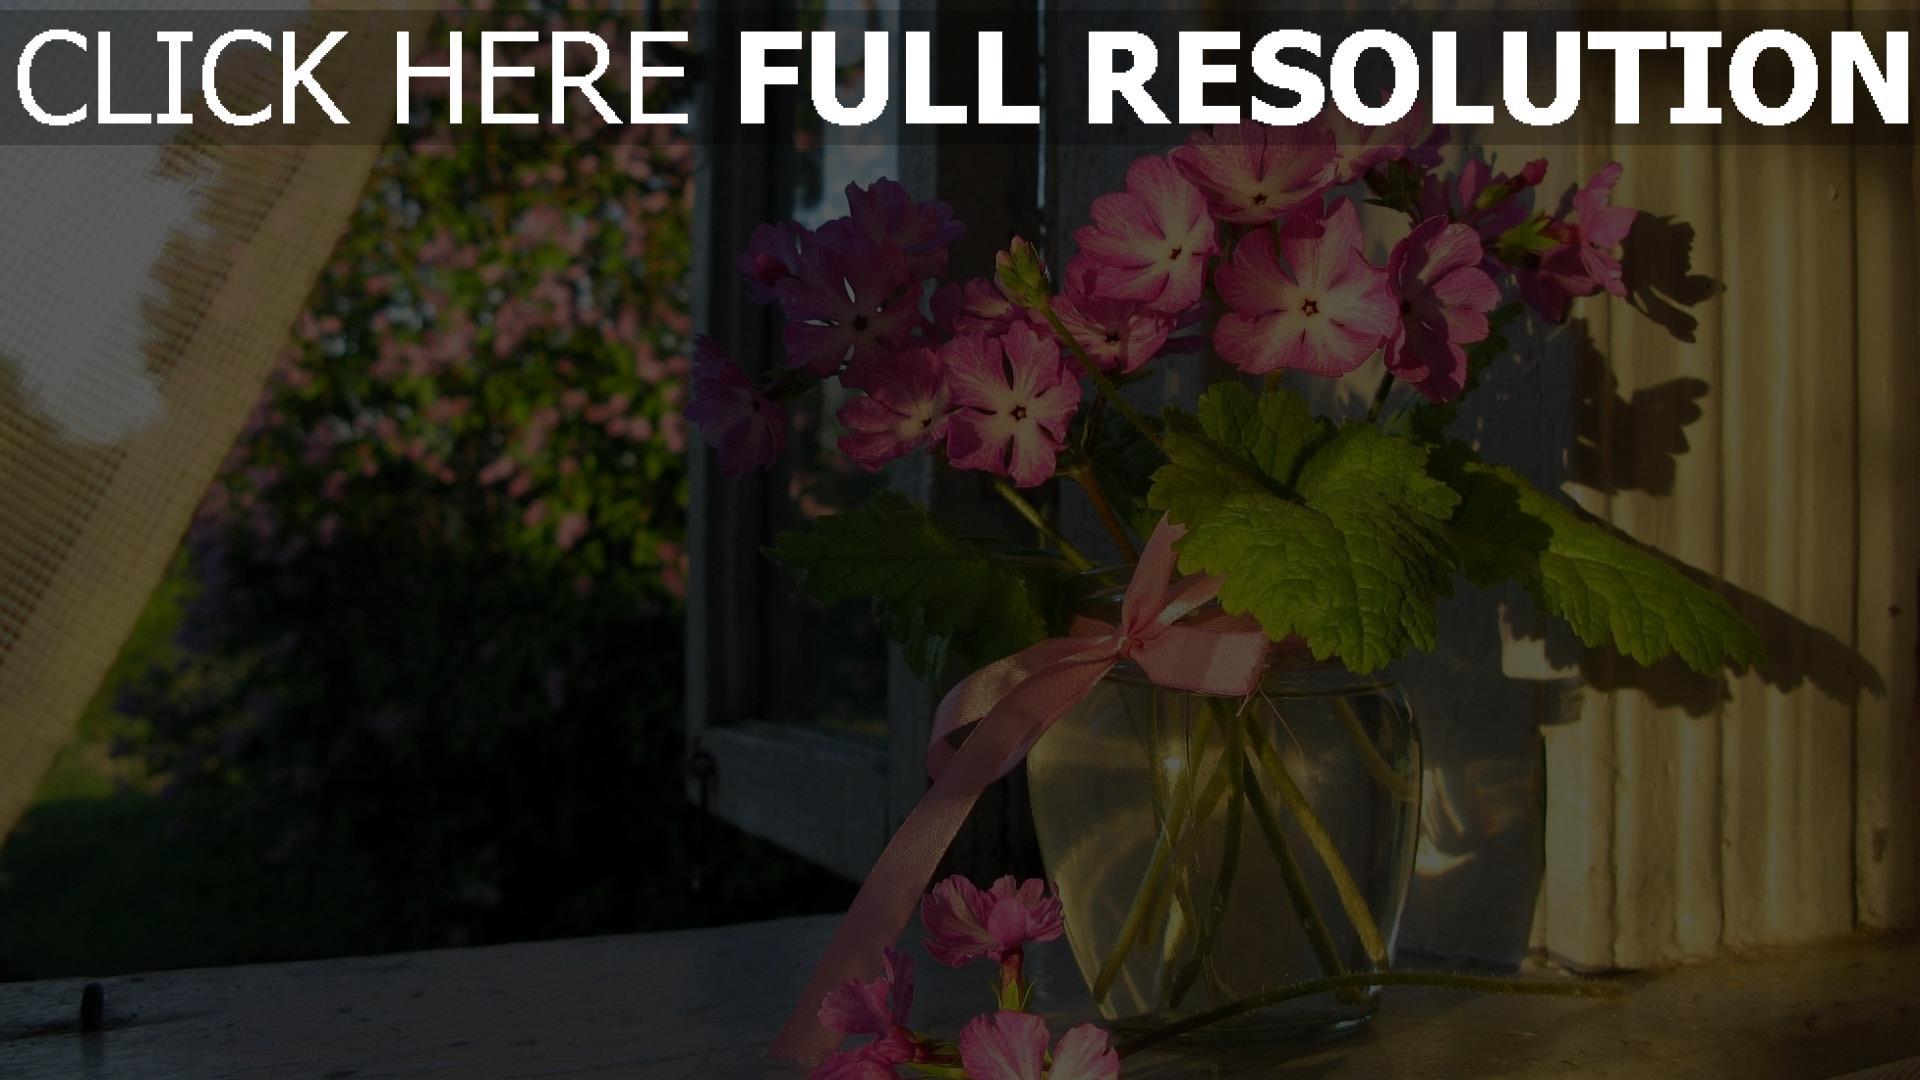 Fenster Band hd hintergrundbilder blumen rosa vase glas fenster band desktop